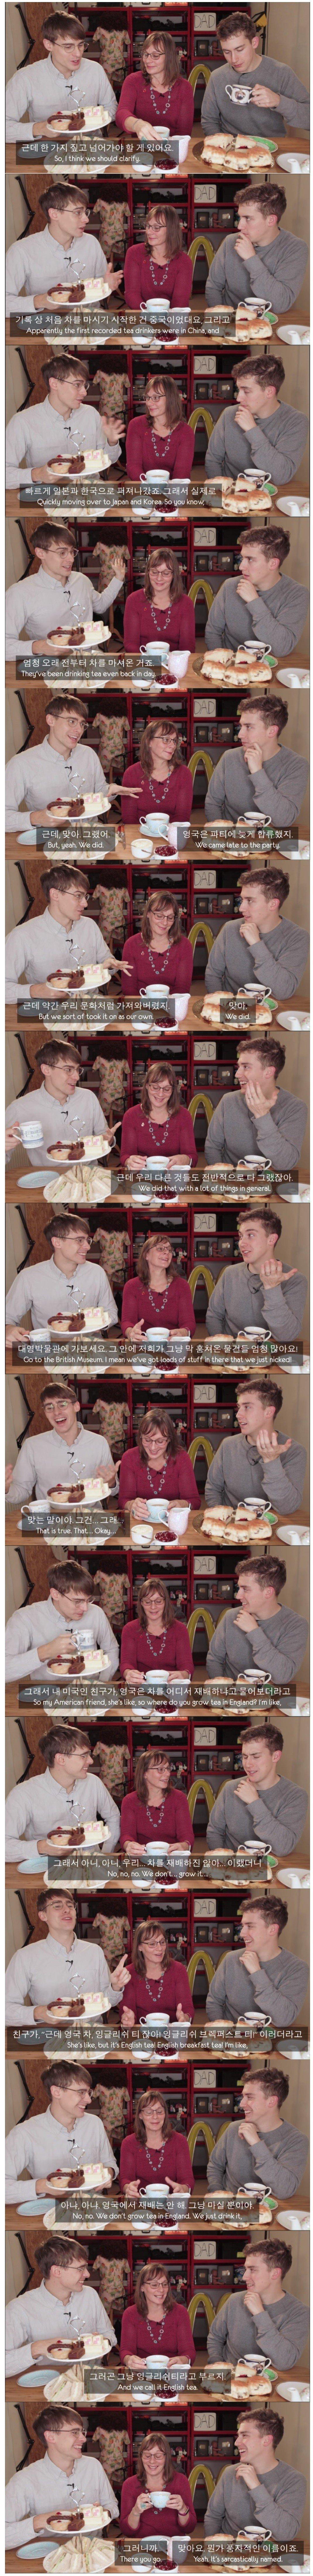 1.jpg 영국인이 말하는 자국문화